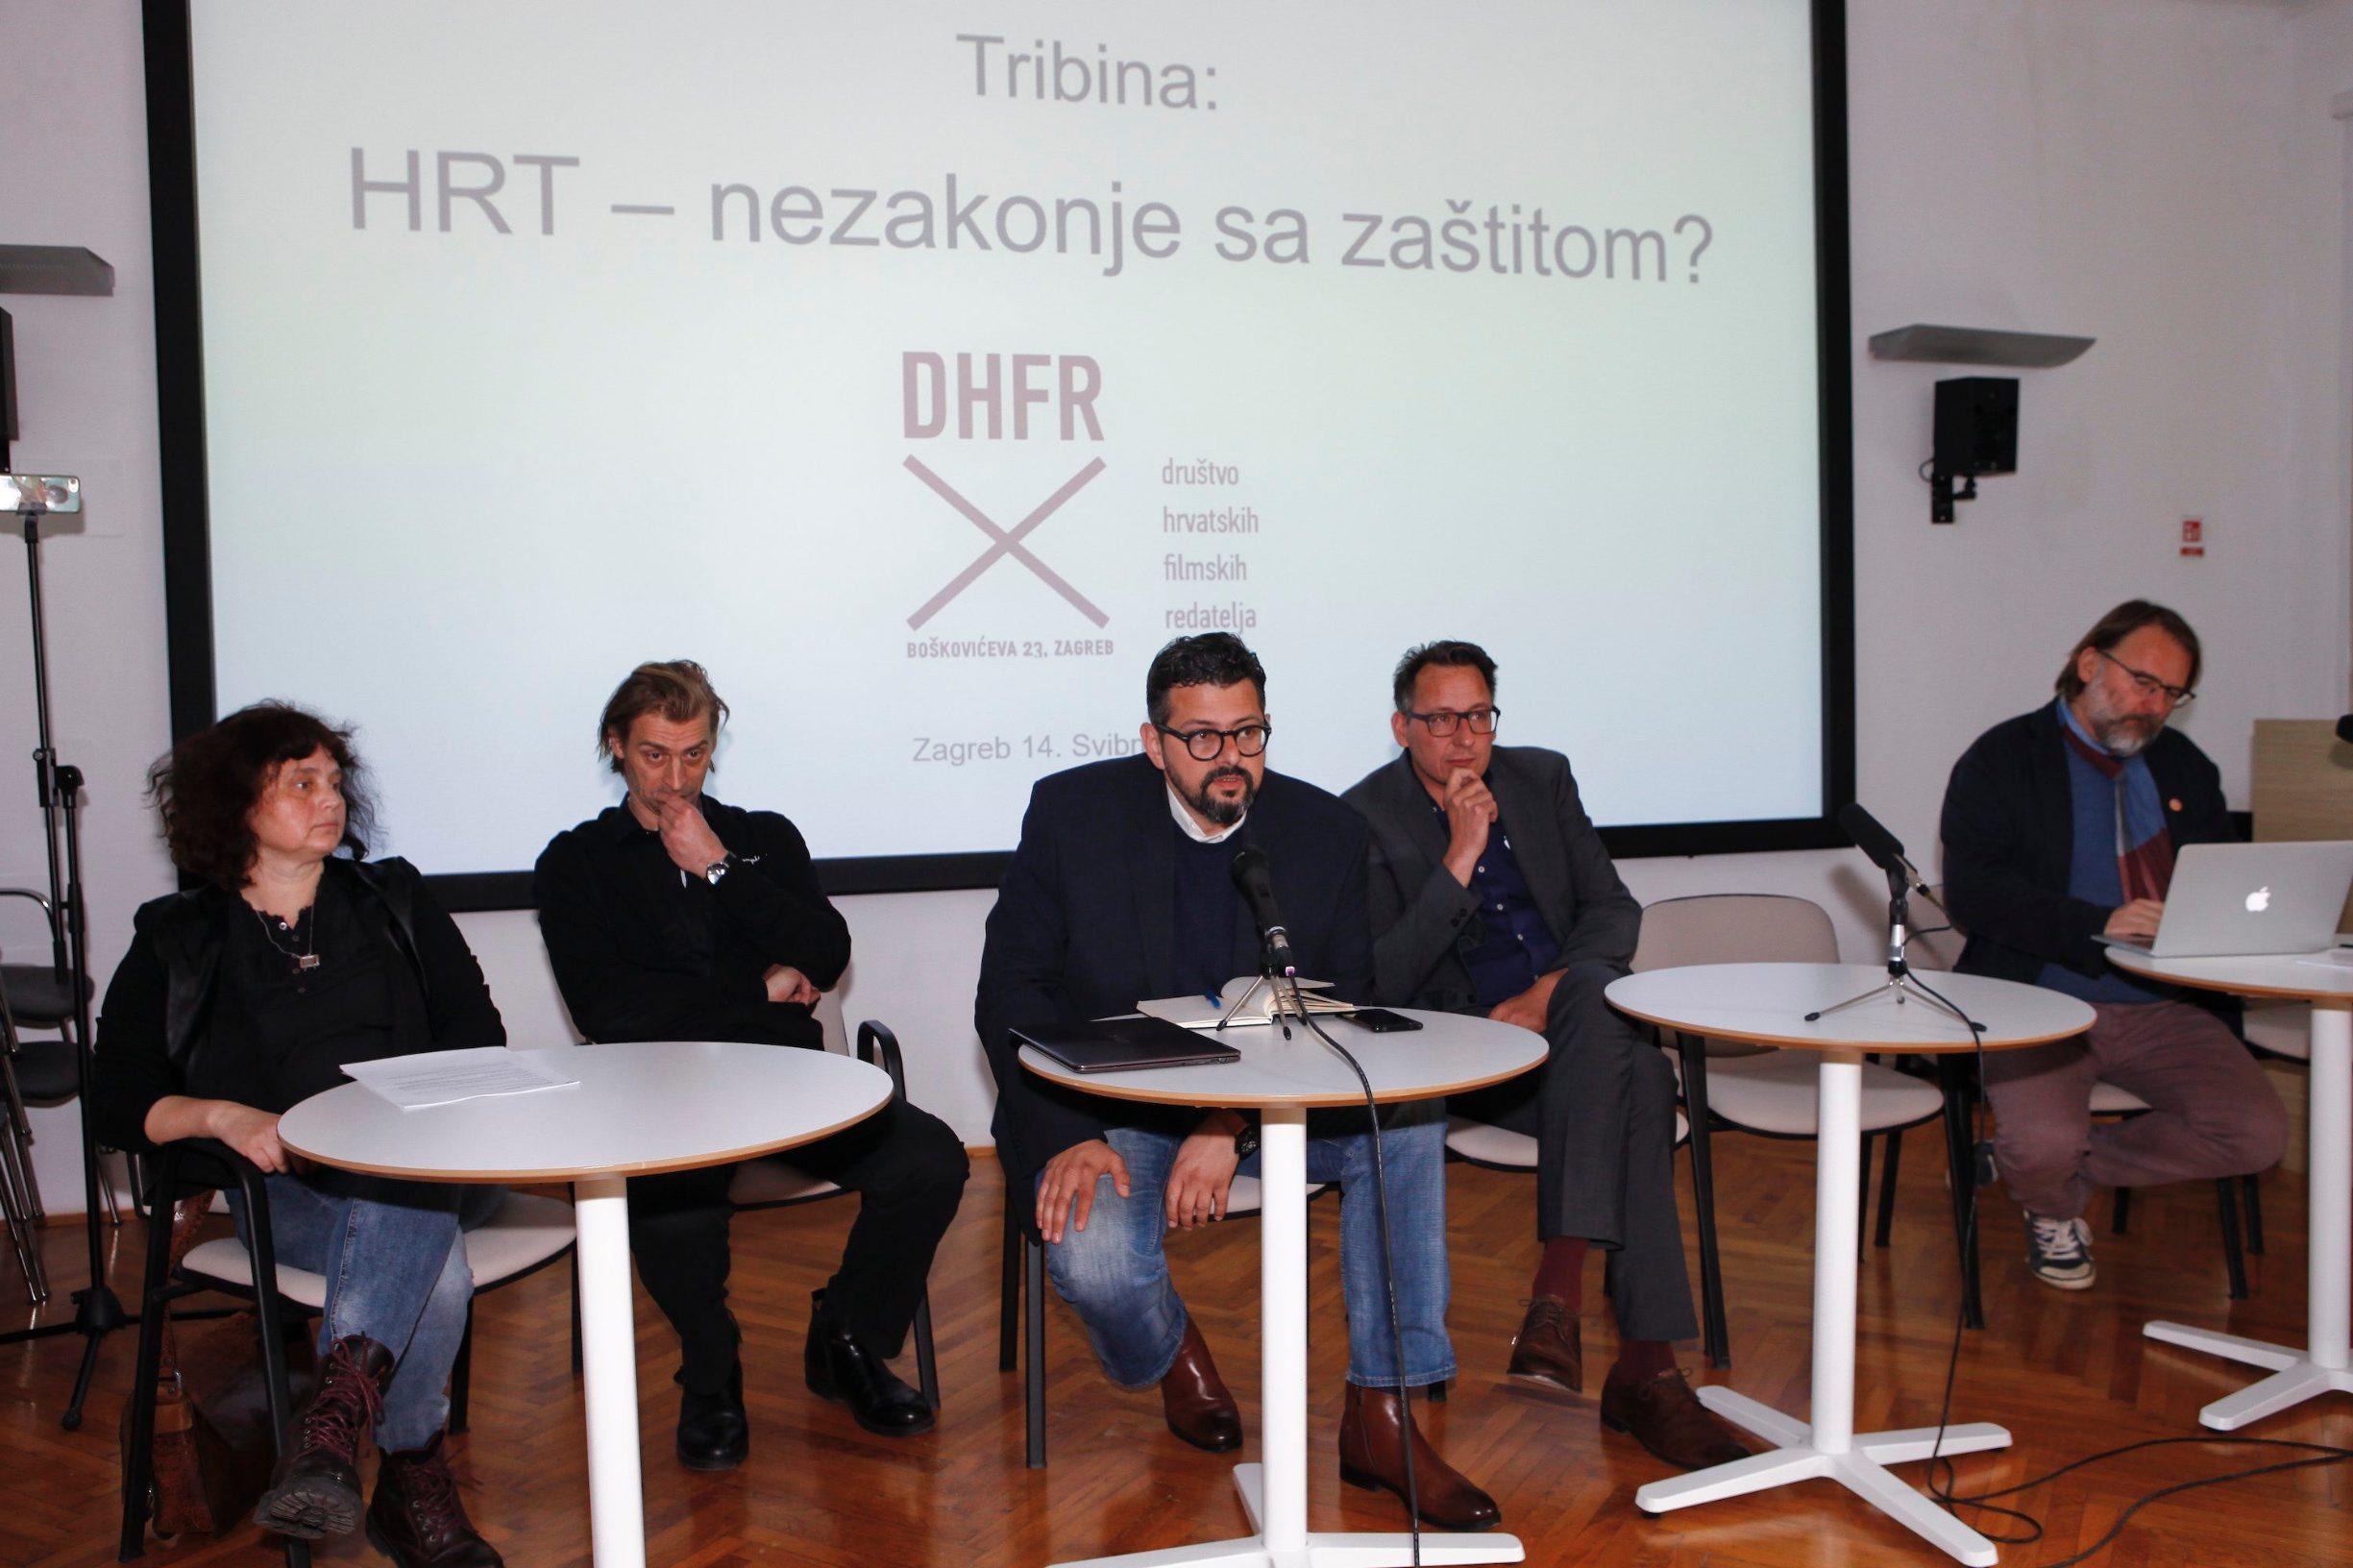 Na fotografiji: Vlatka Vorkapić, Antonio Nuić, Robert Zuber, Josip Popovac, Hrvoje Hribar